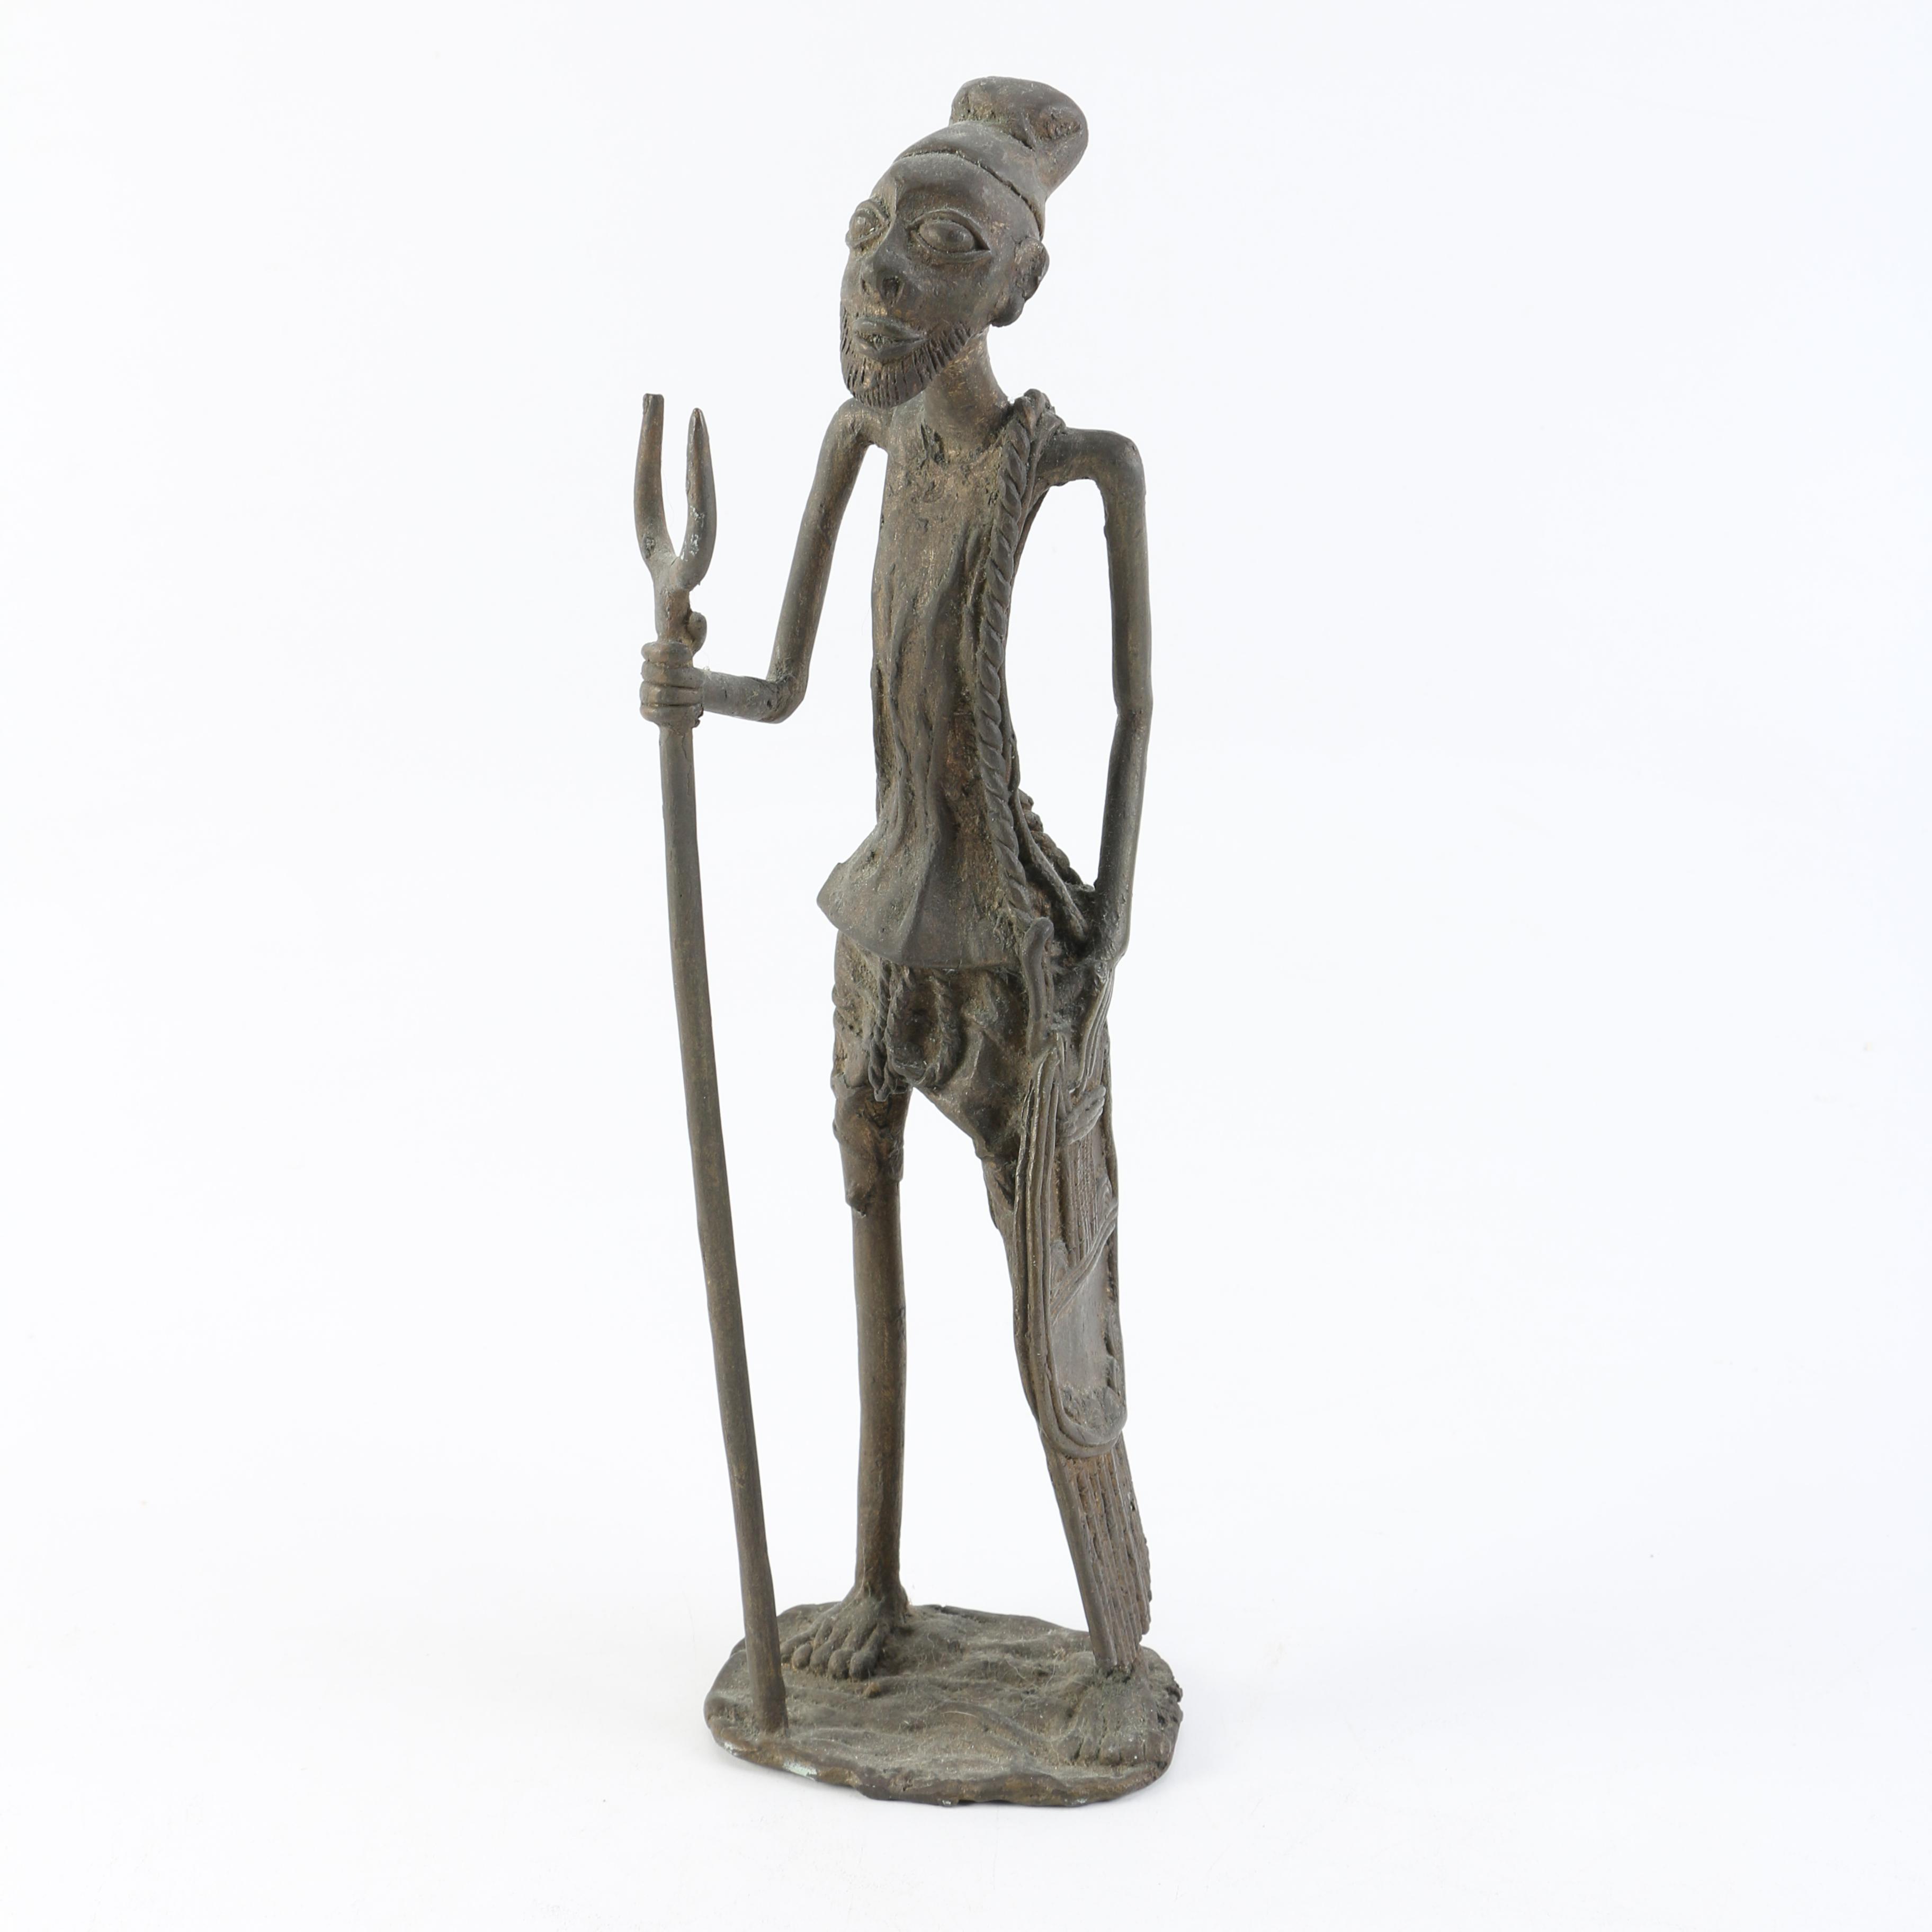 East African Figural Sculpture